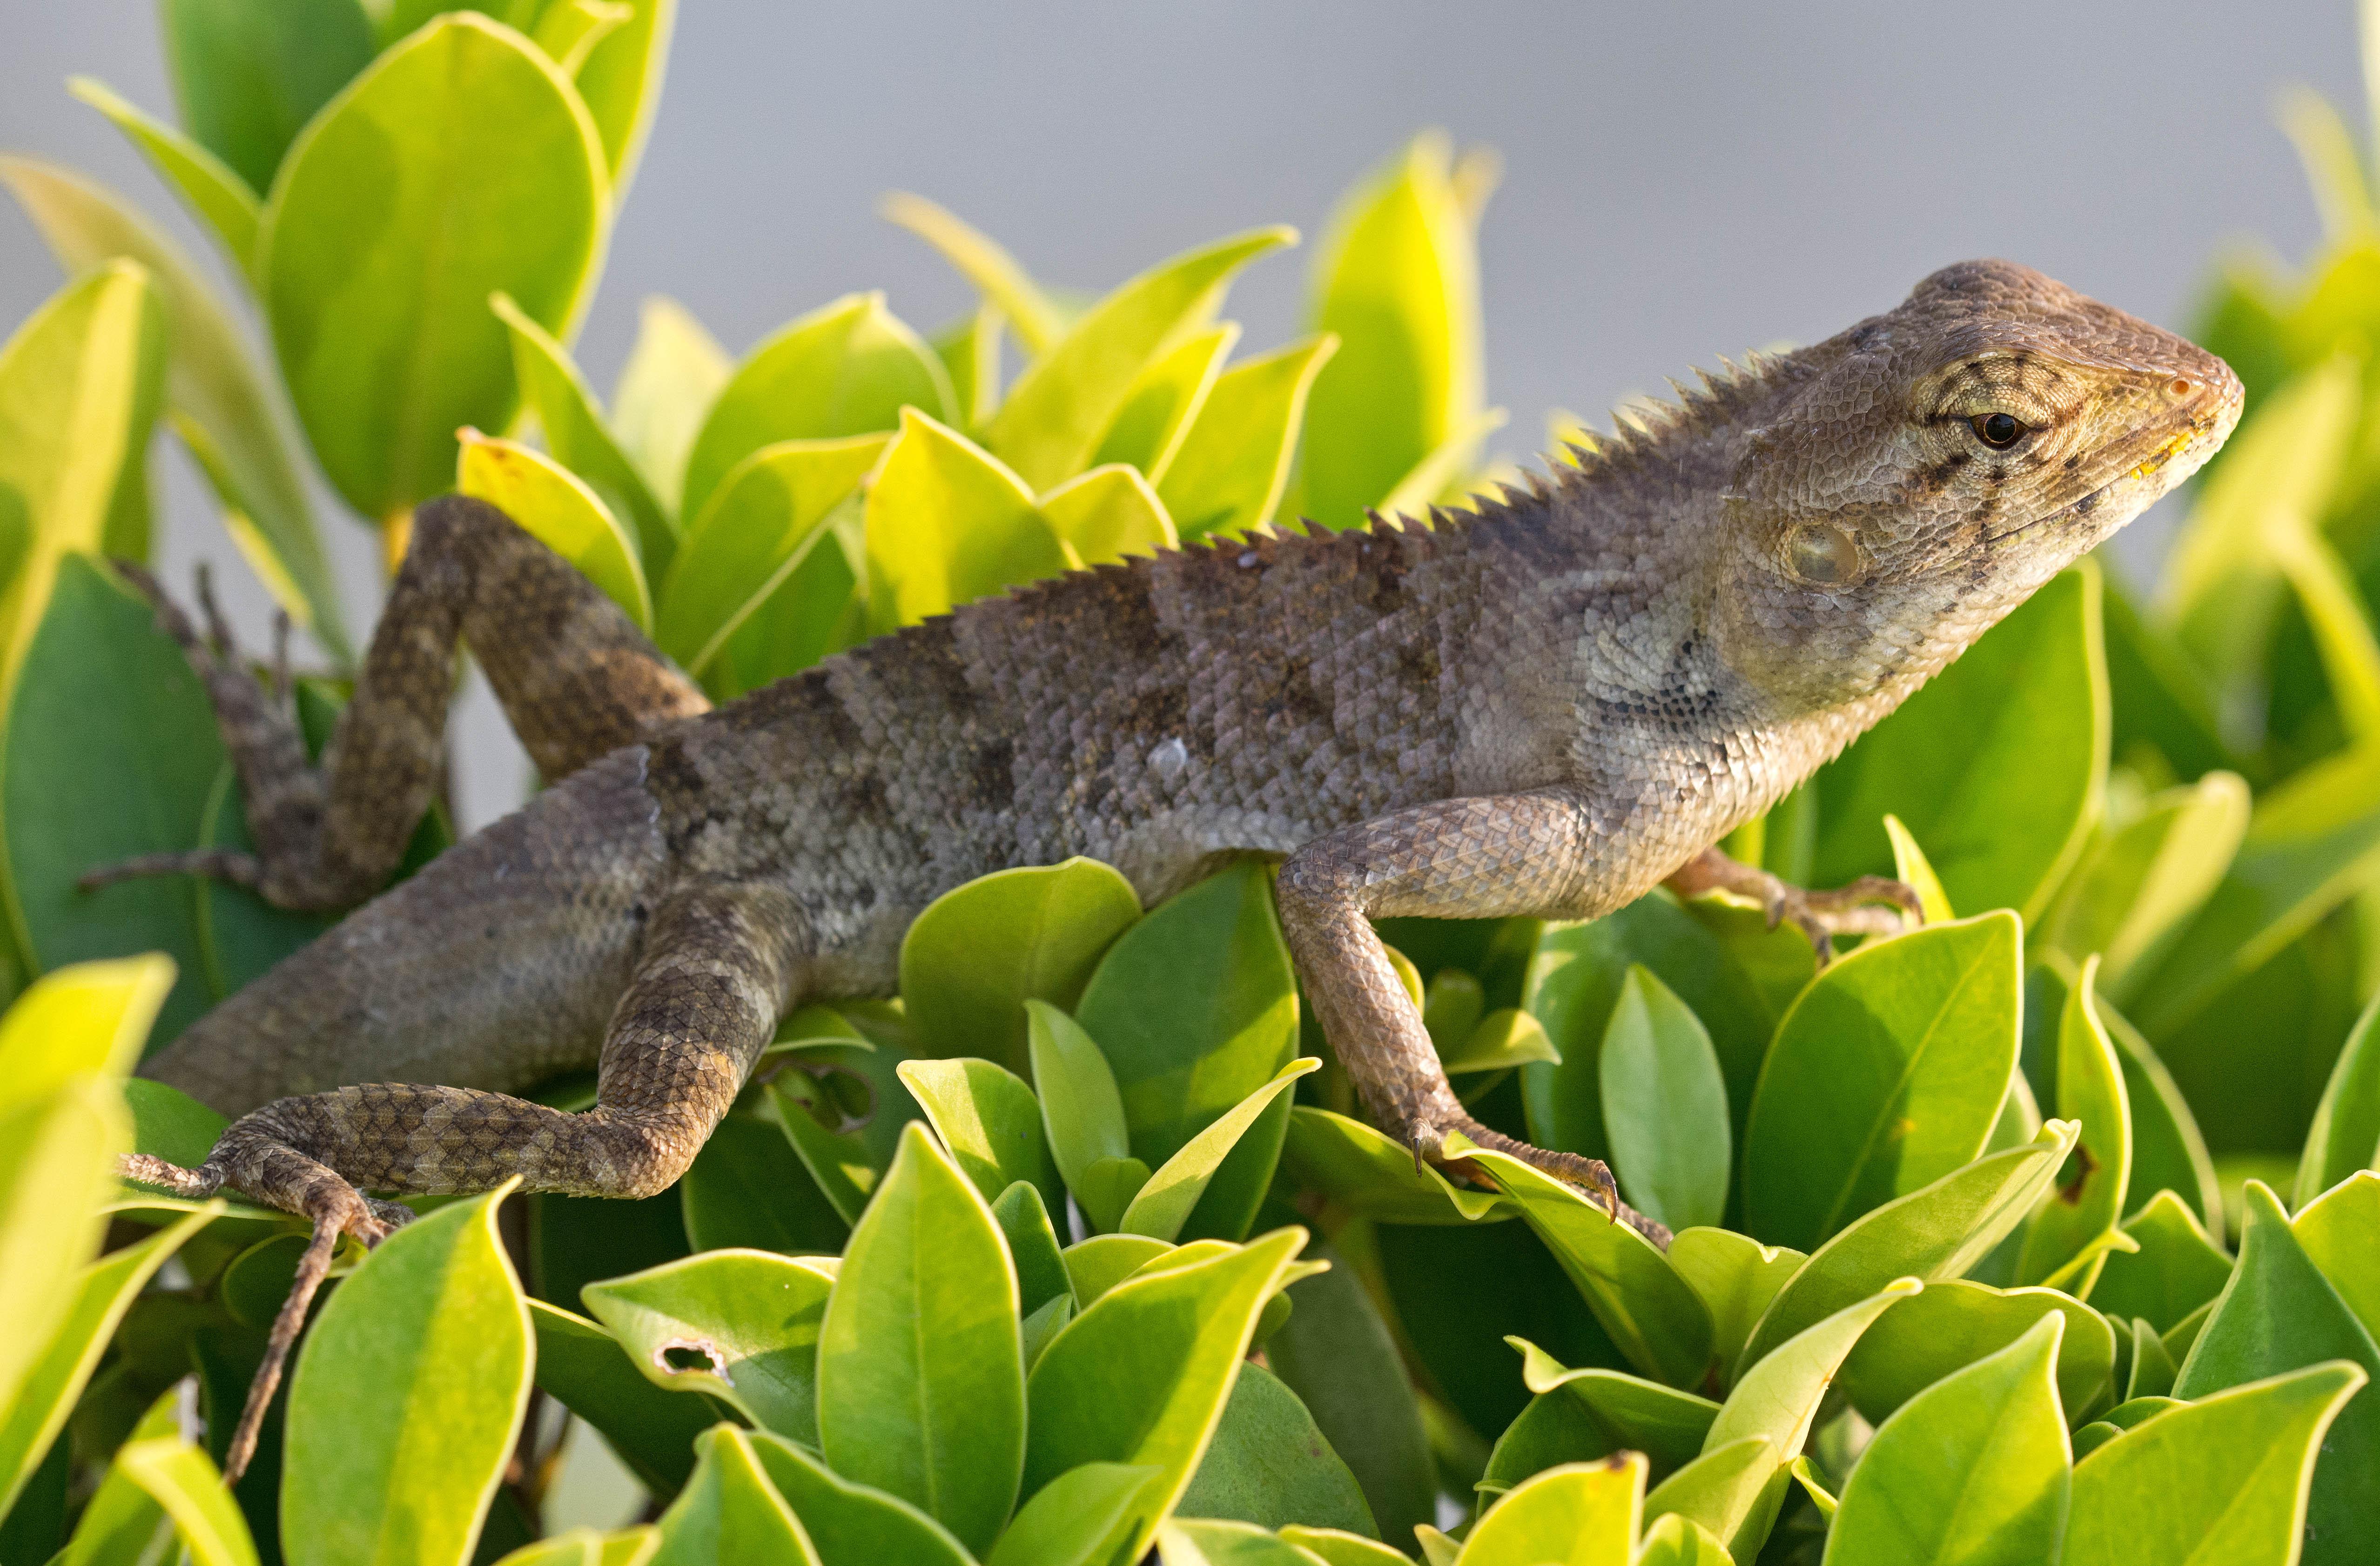 oriental garden lizard calotes versicolor basking on a hedge in late october in thailand - Garden Lizard